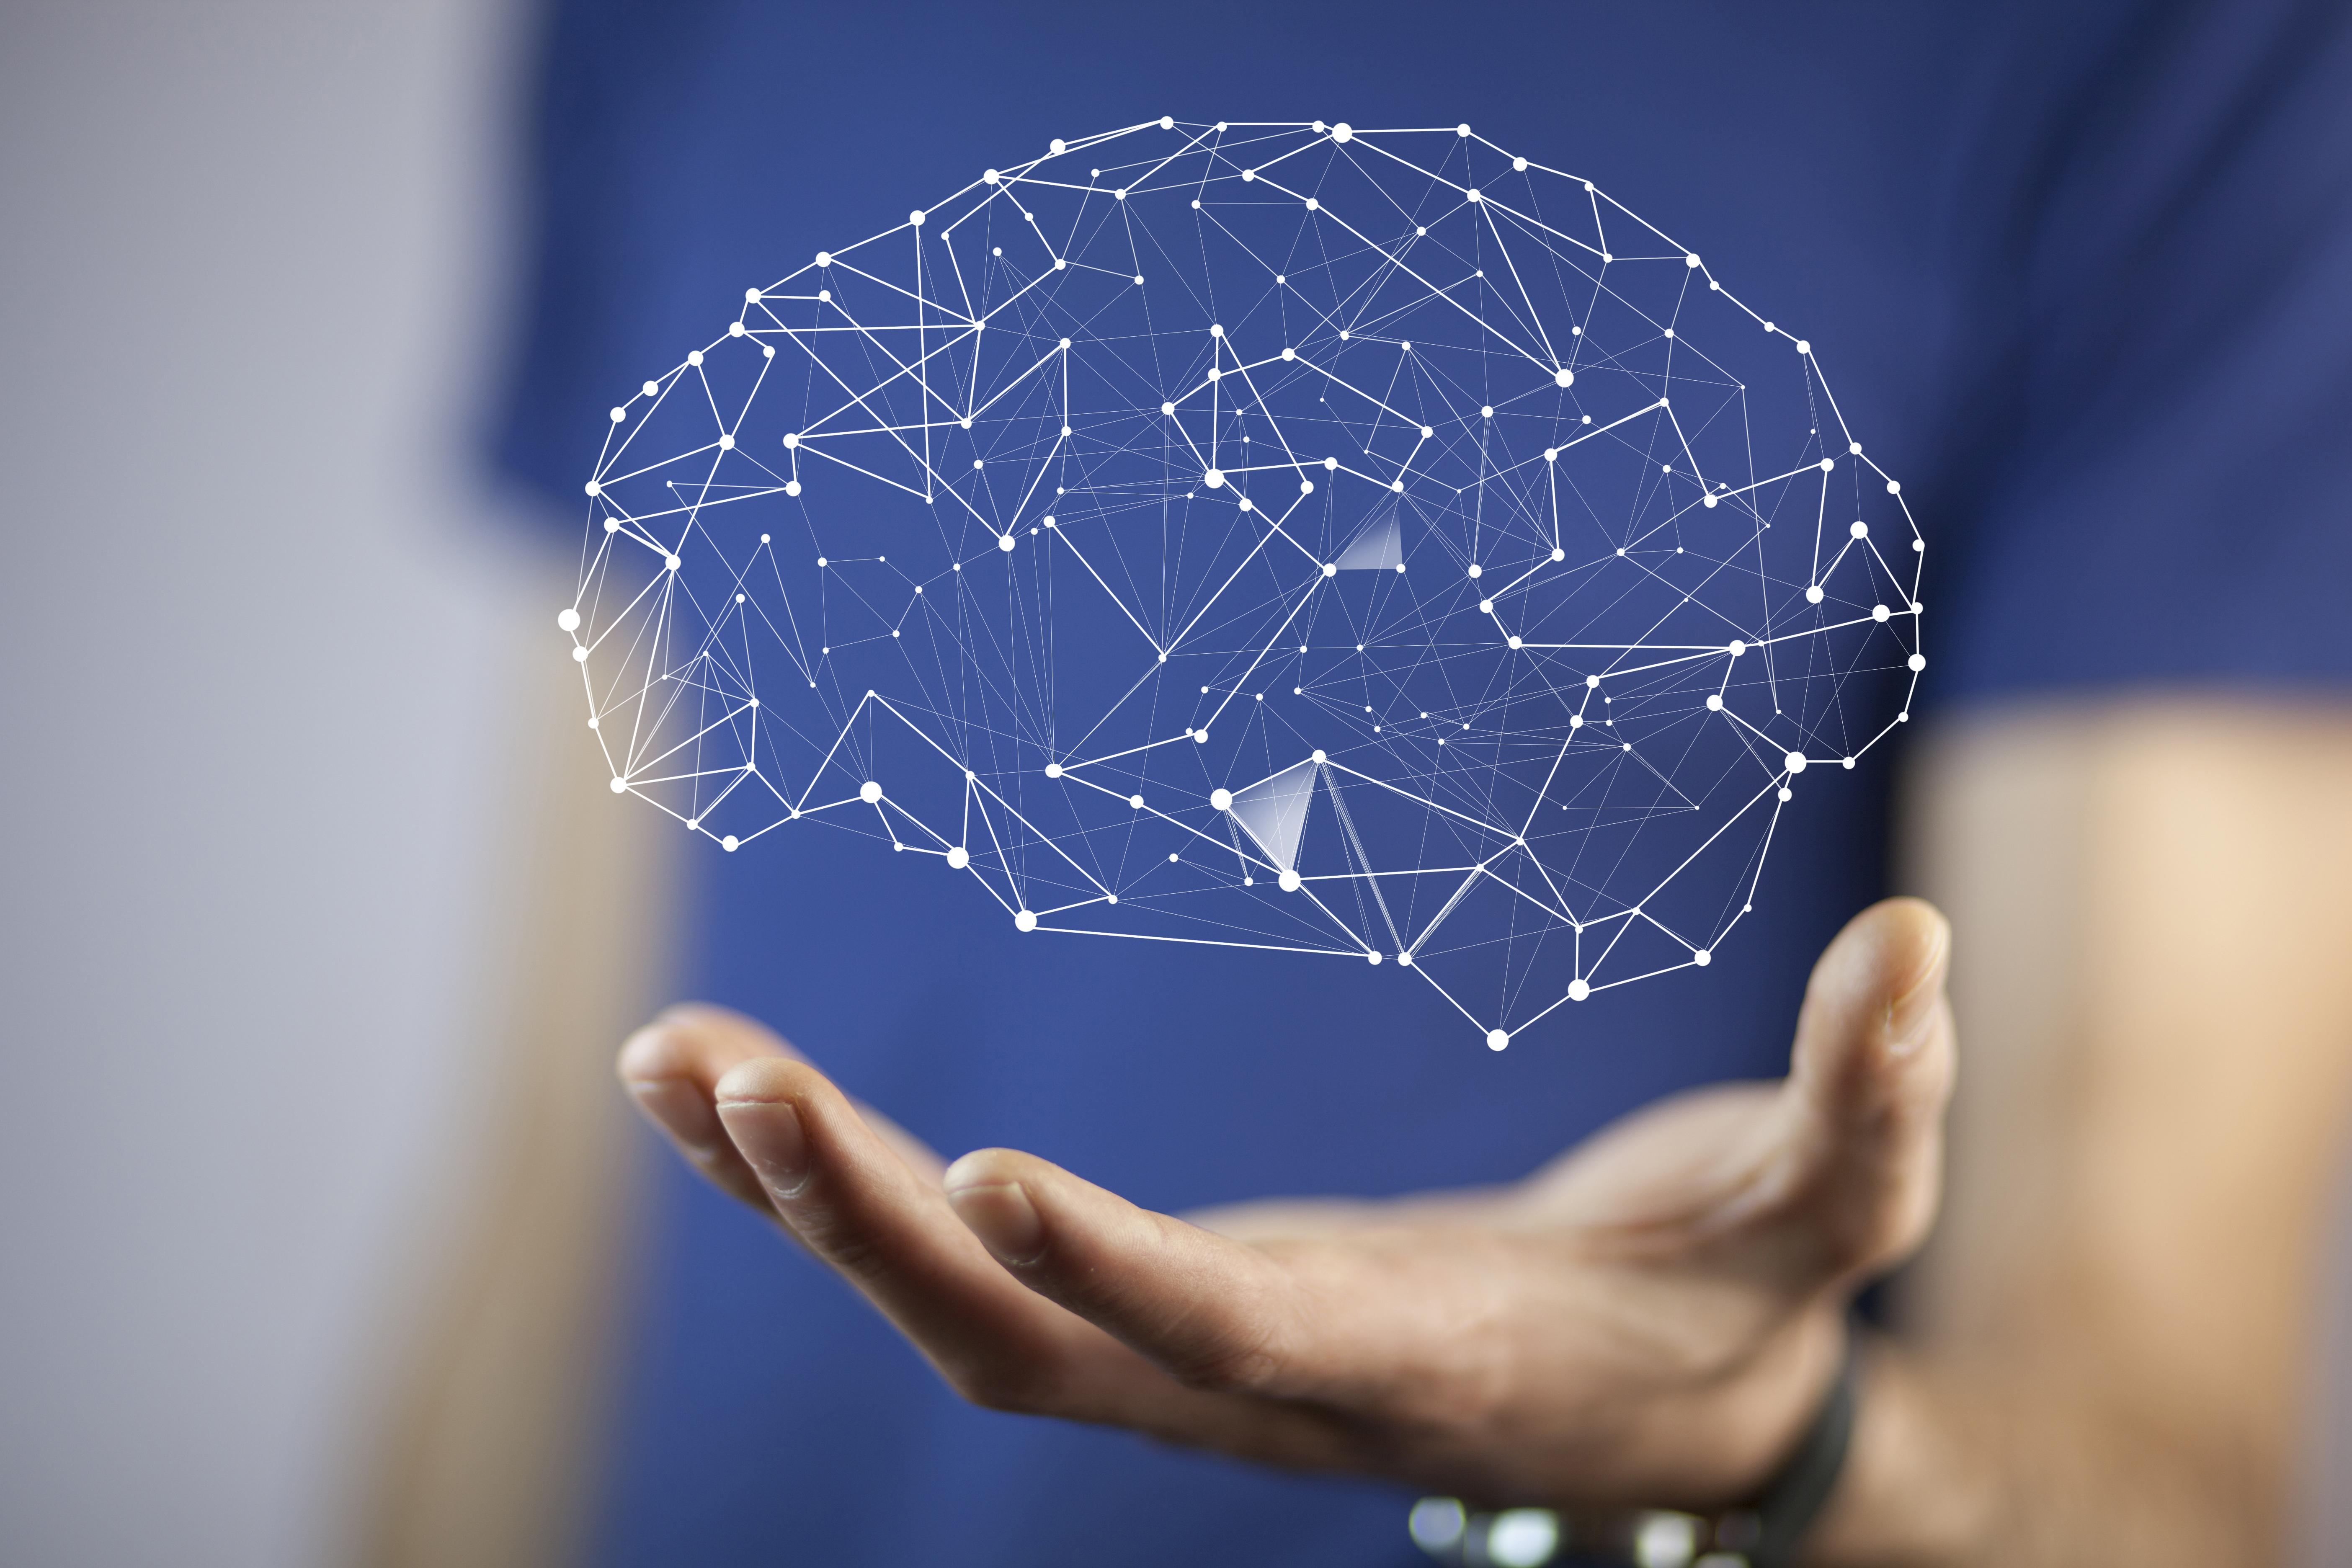 Neuropsychological Model of Cognition